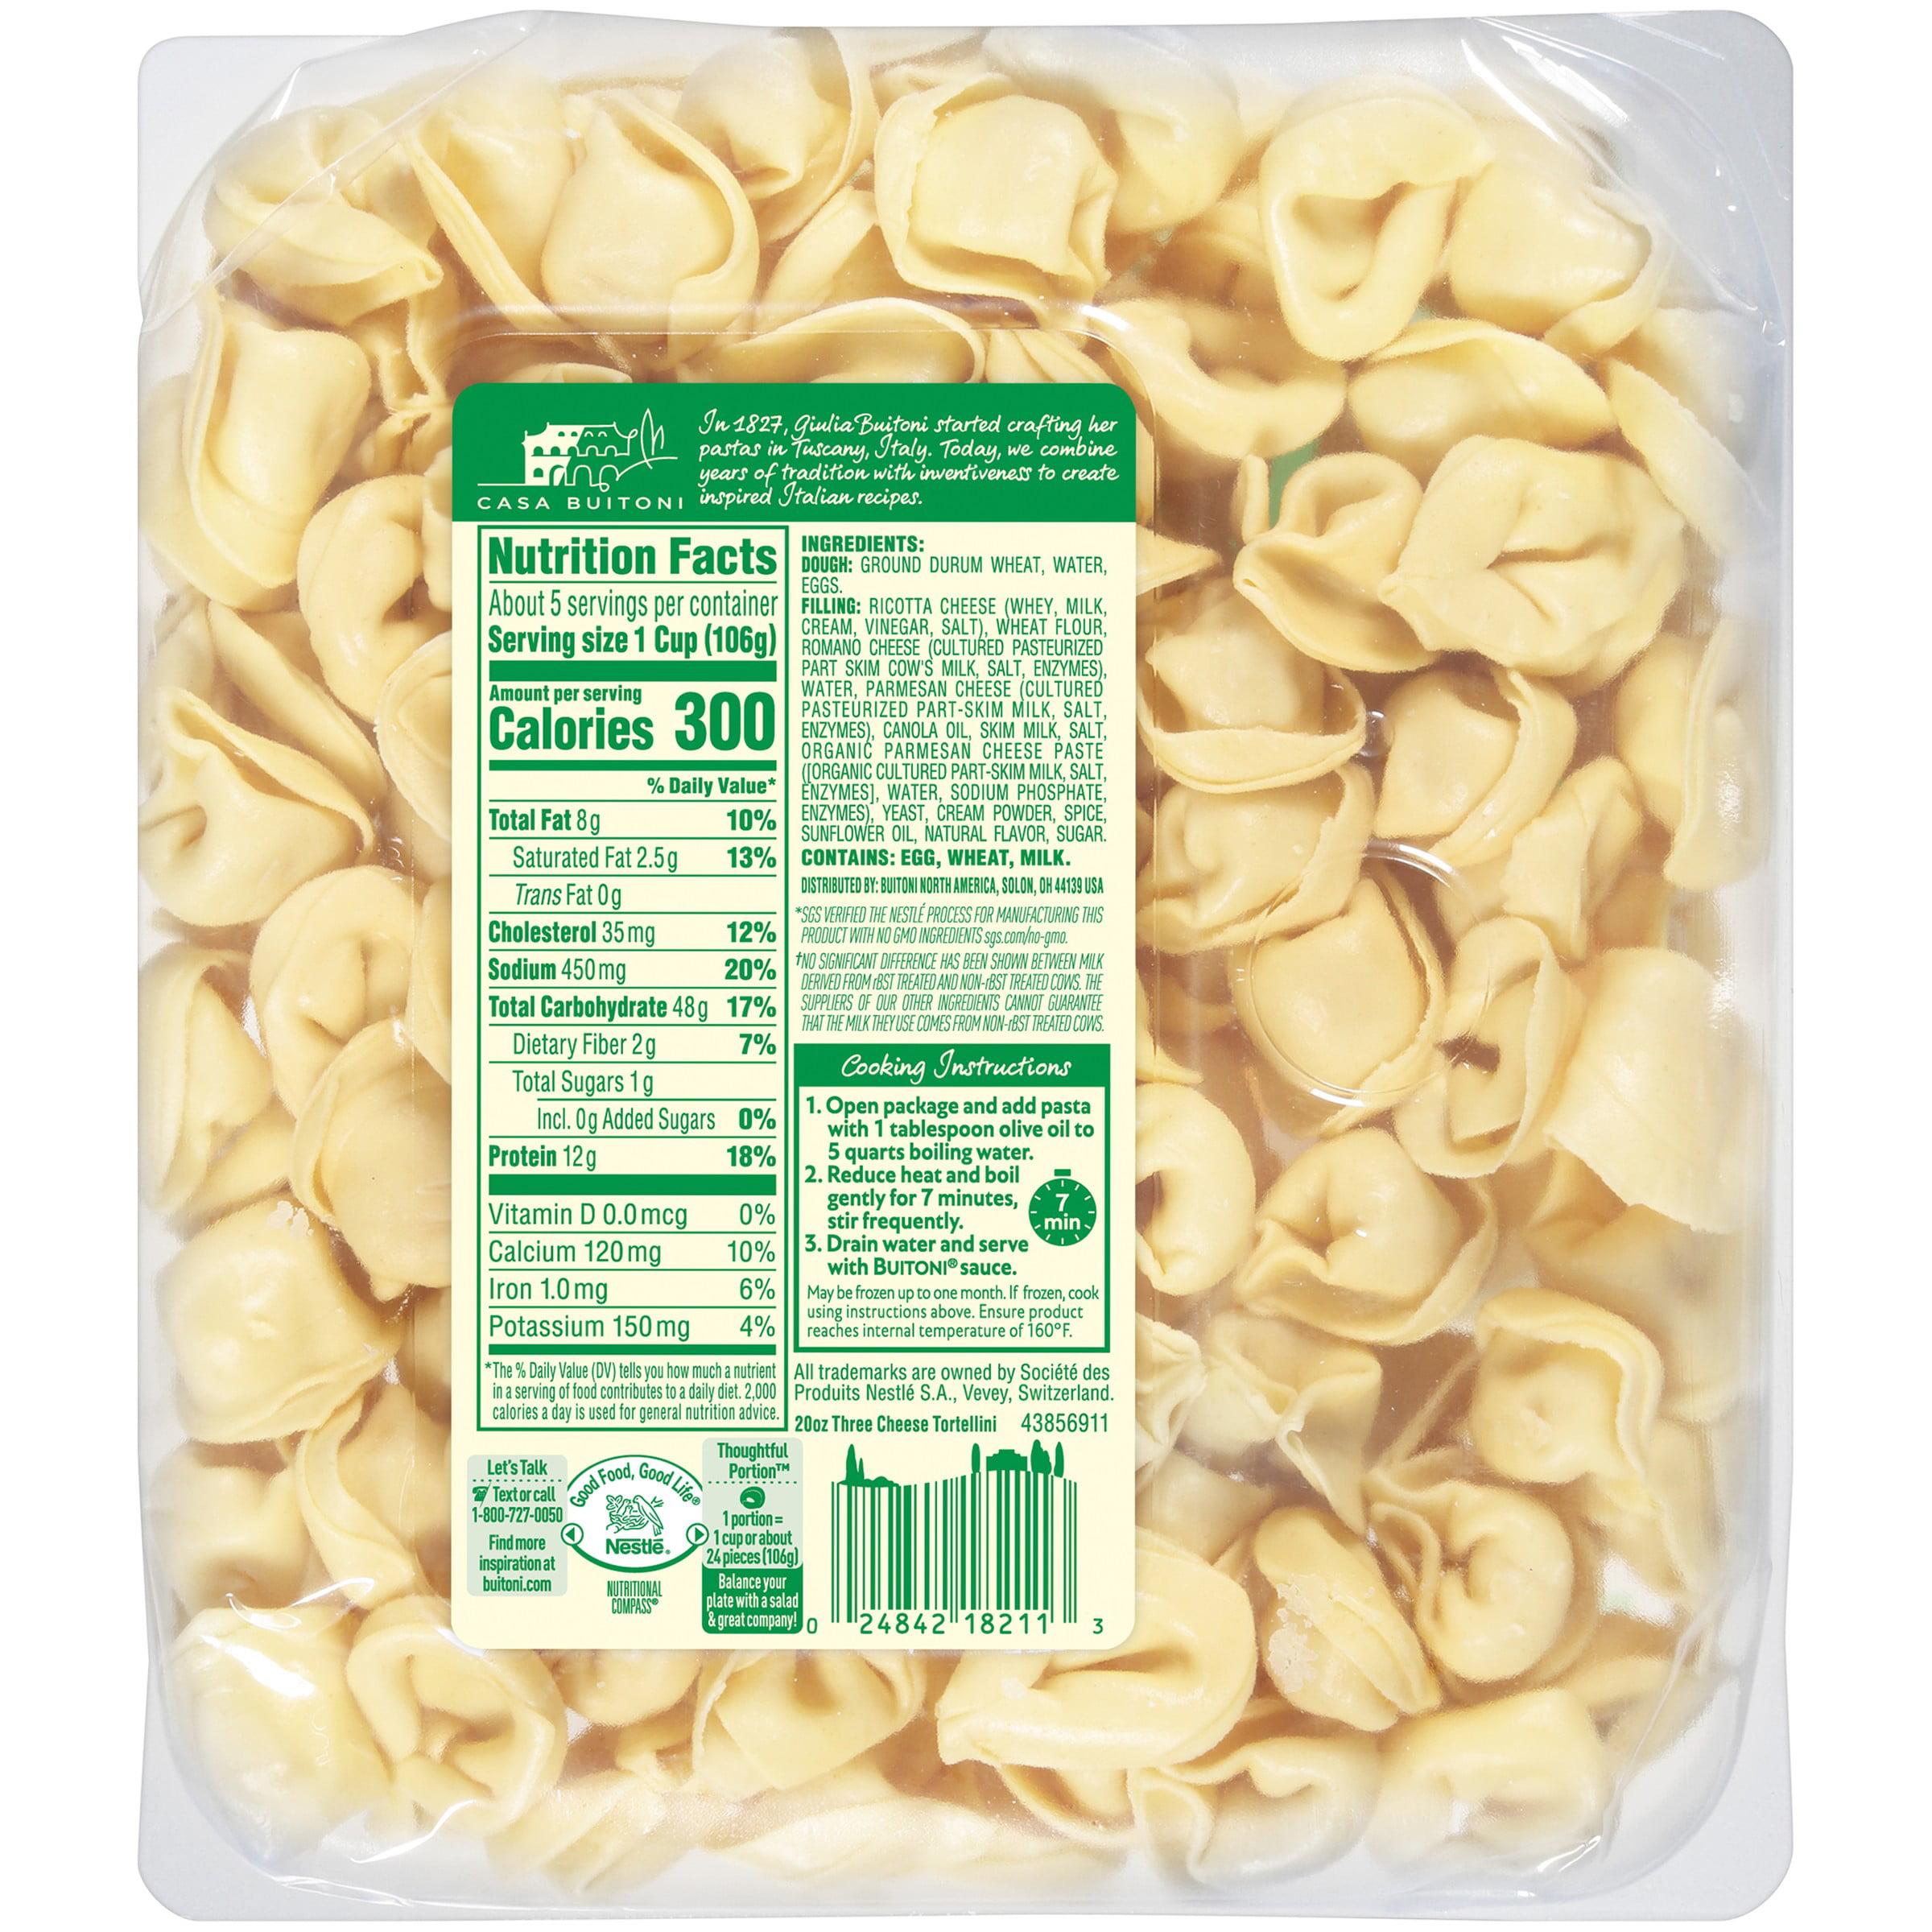 Buitoni Three Cheese Tortellini Refrigerated Pasta 20 Oz Family